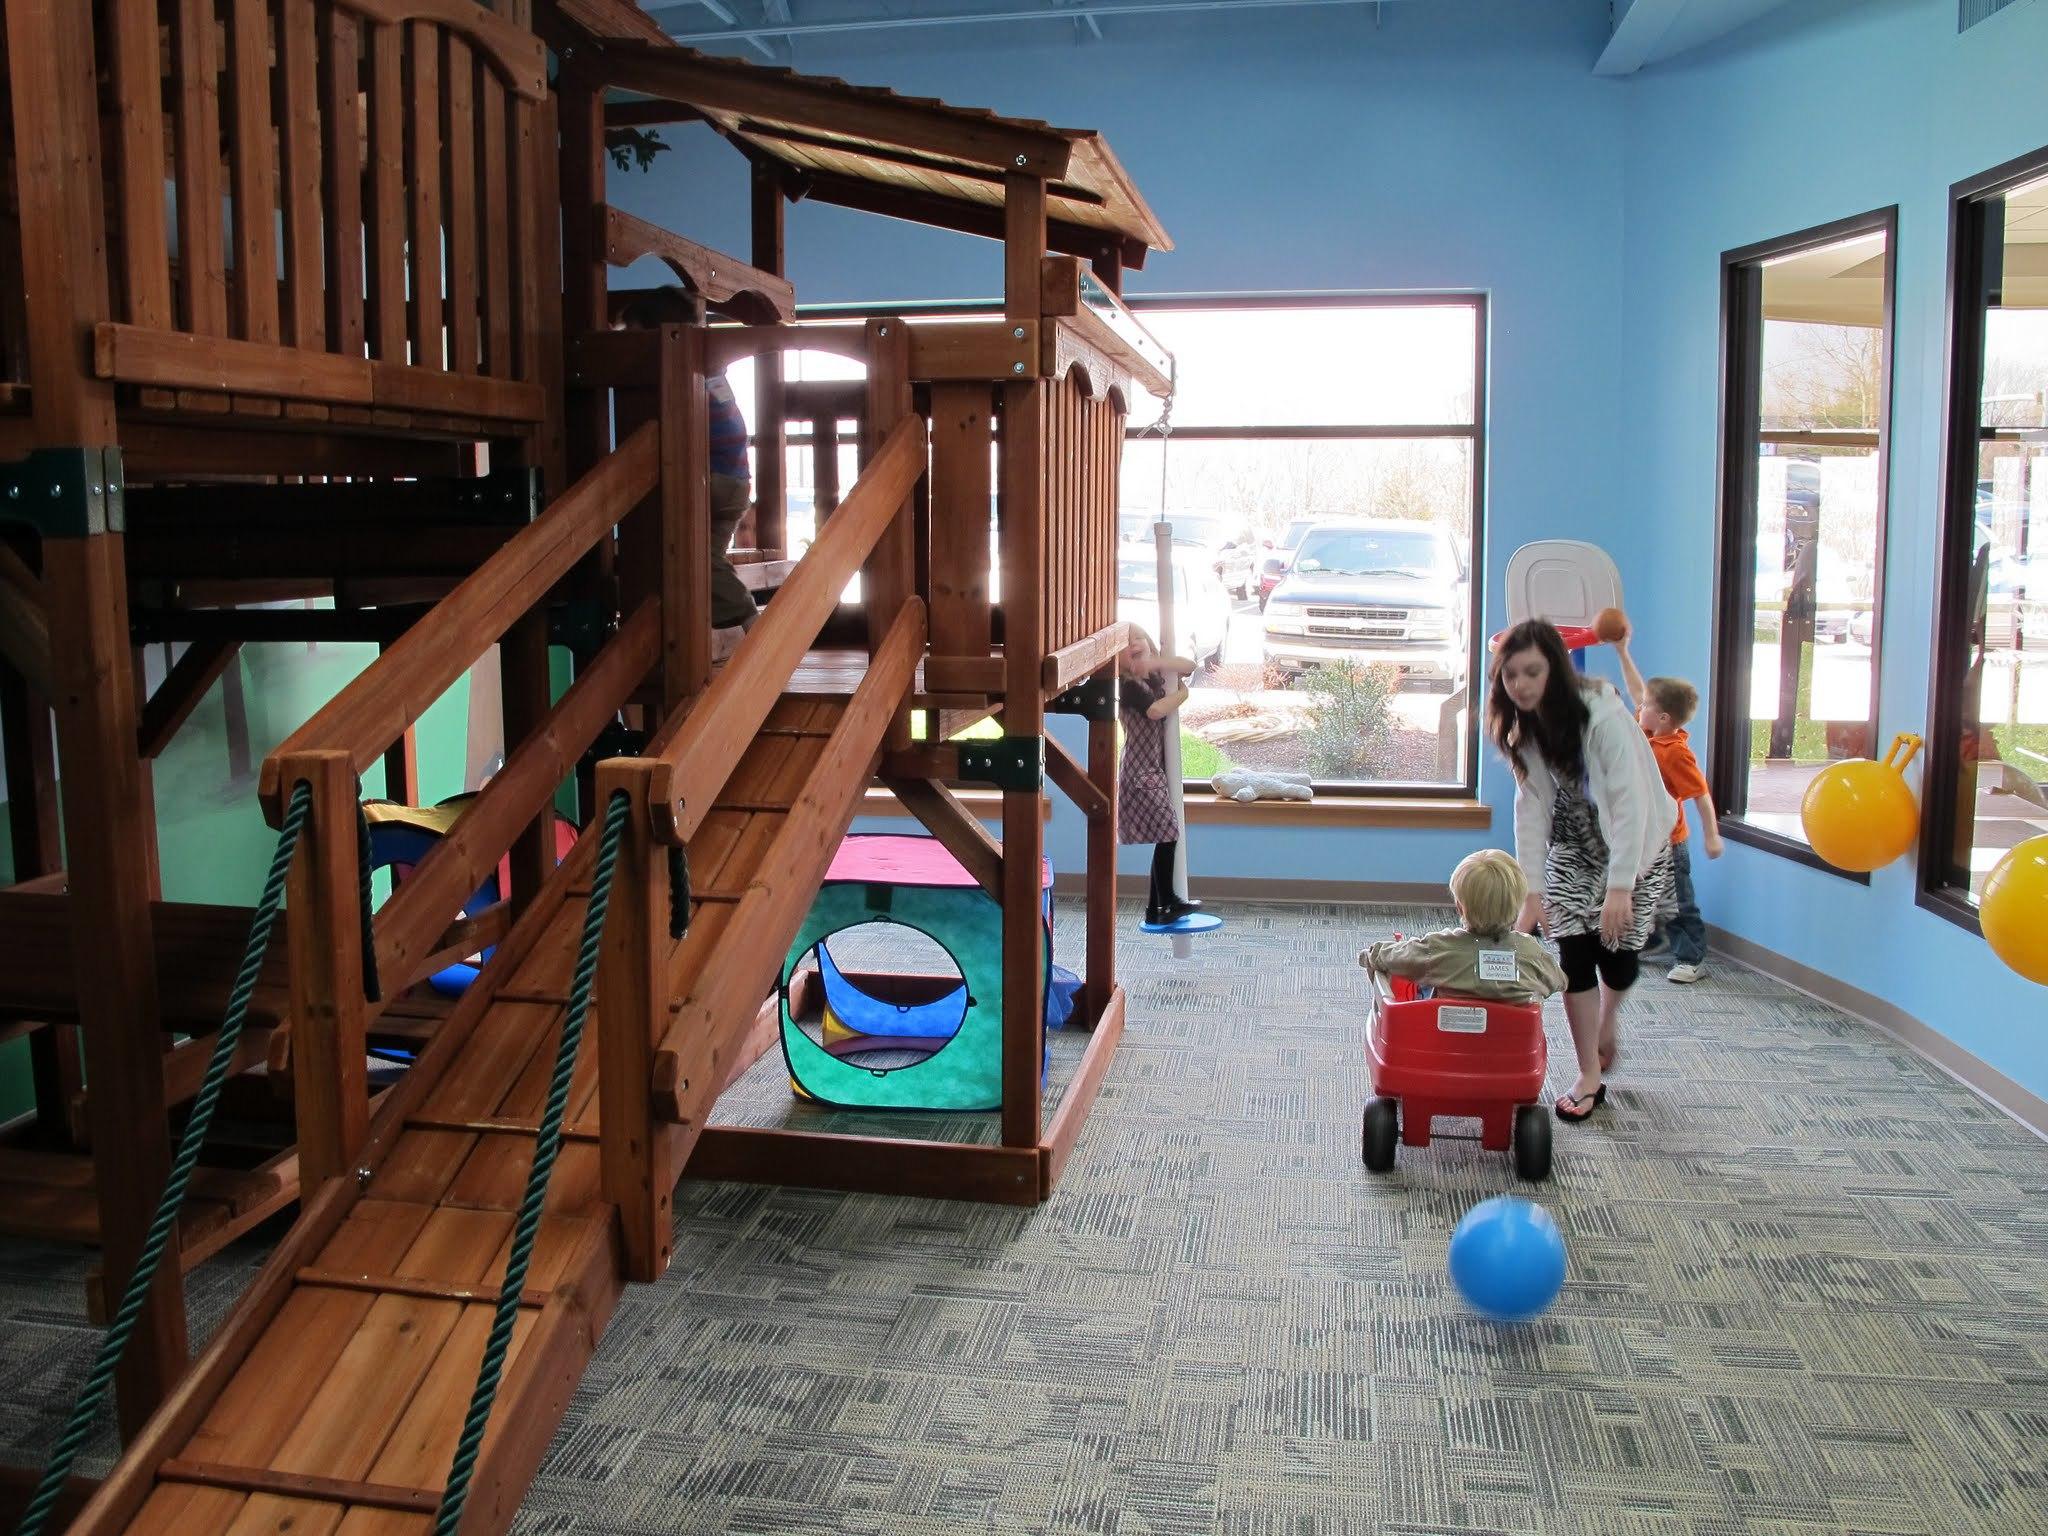 grace community chapel church indoor playground.JPG